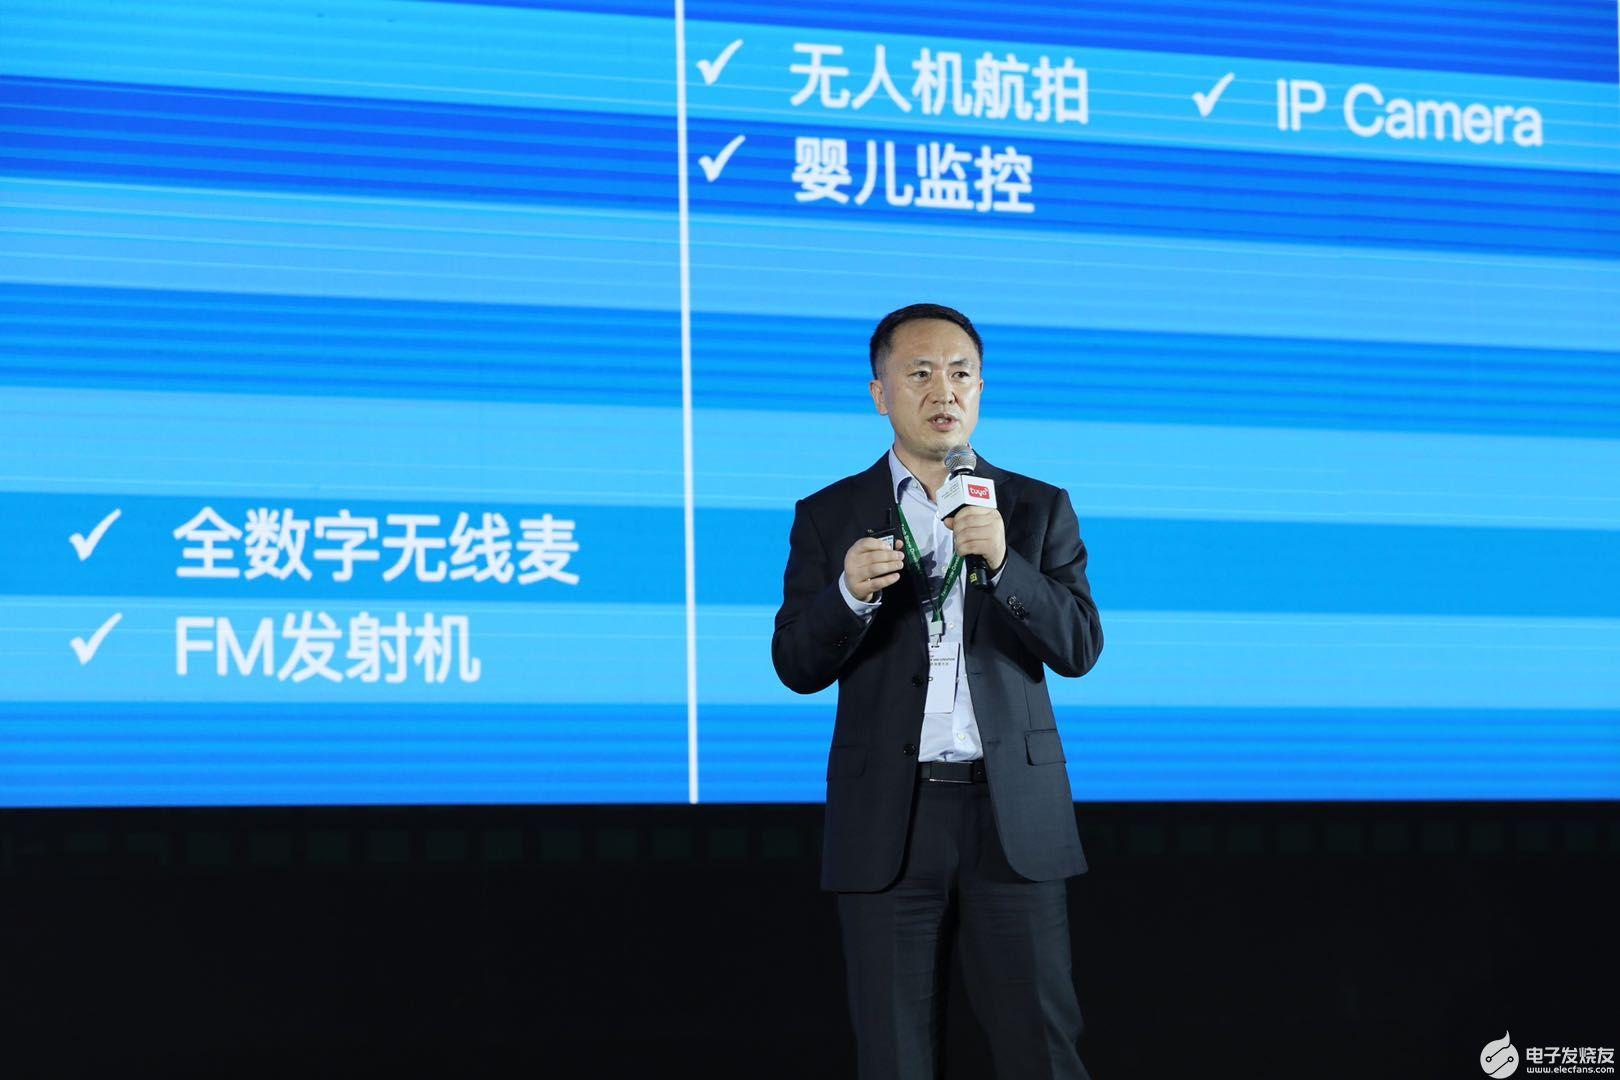 http://www.reviewcode.cn/shujuku/178505.html